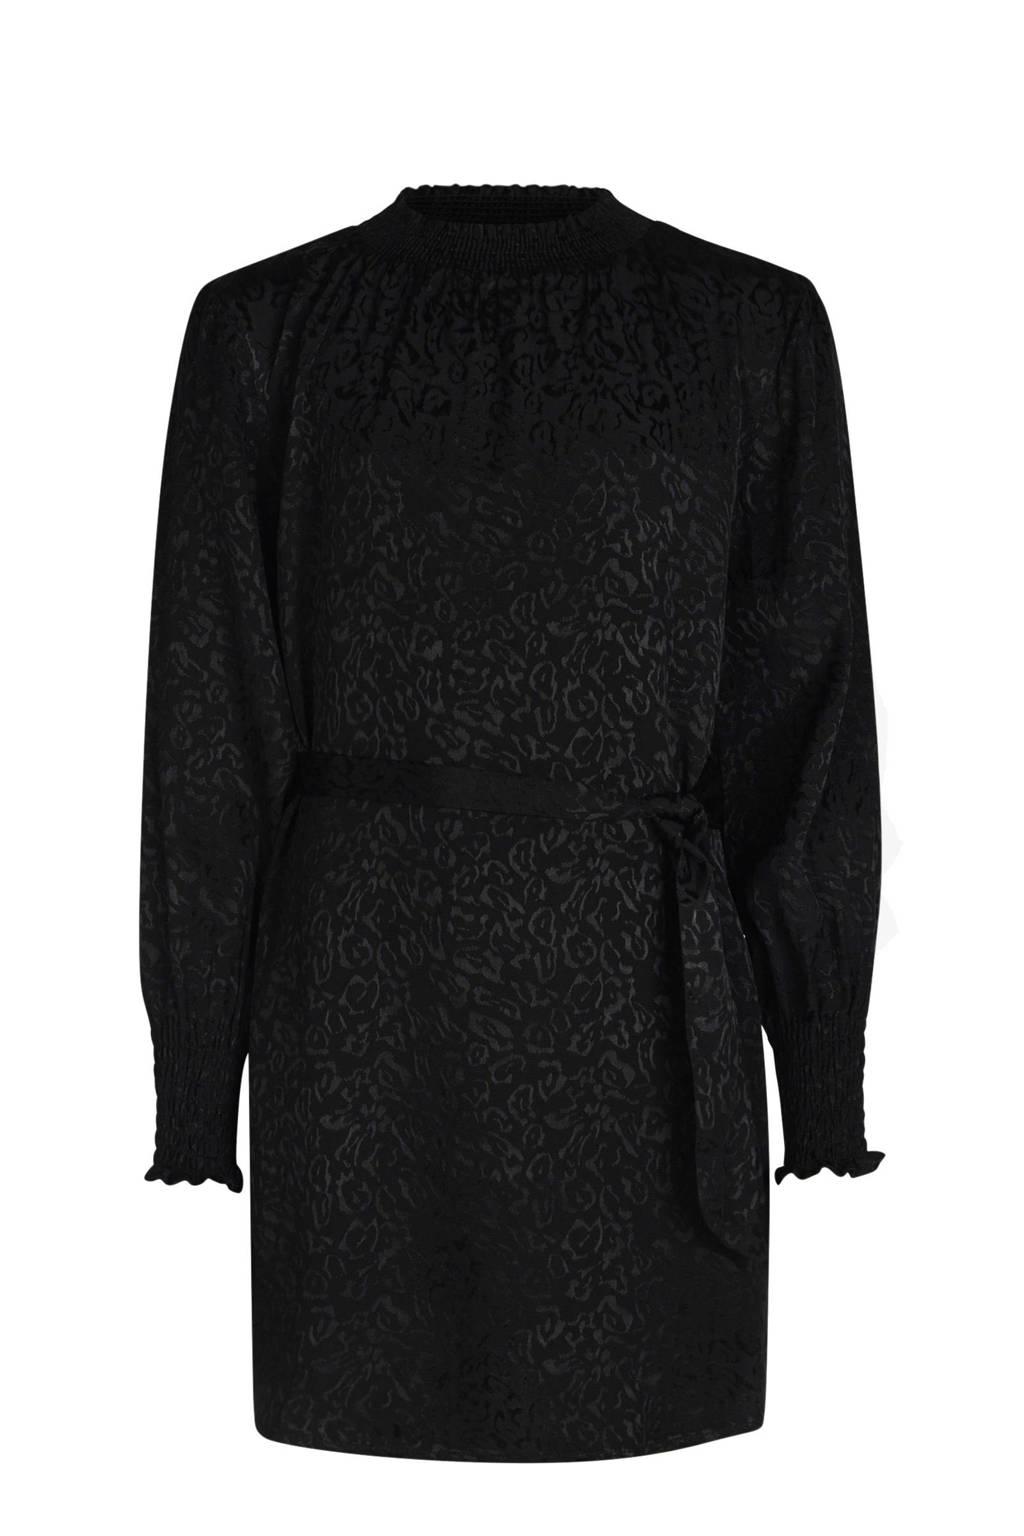 Jill & Mitch by Shoeby jurk Catice met all over print en ceintuur zwart, Zwart